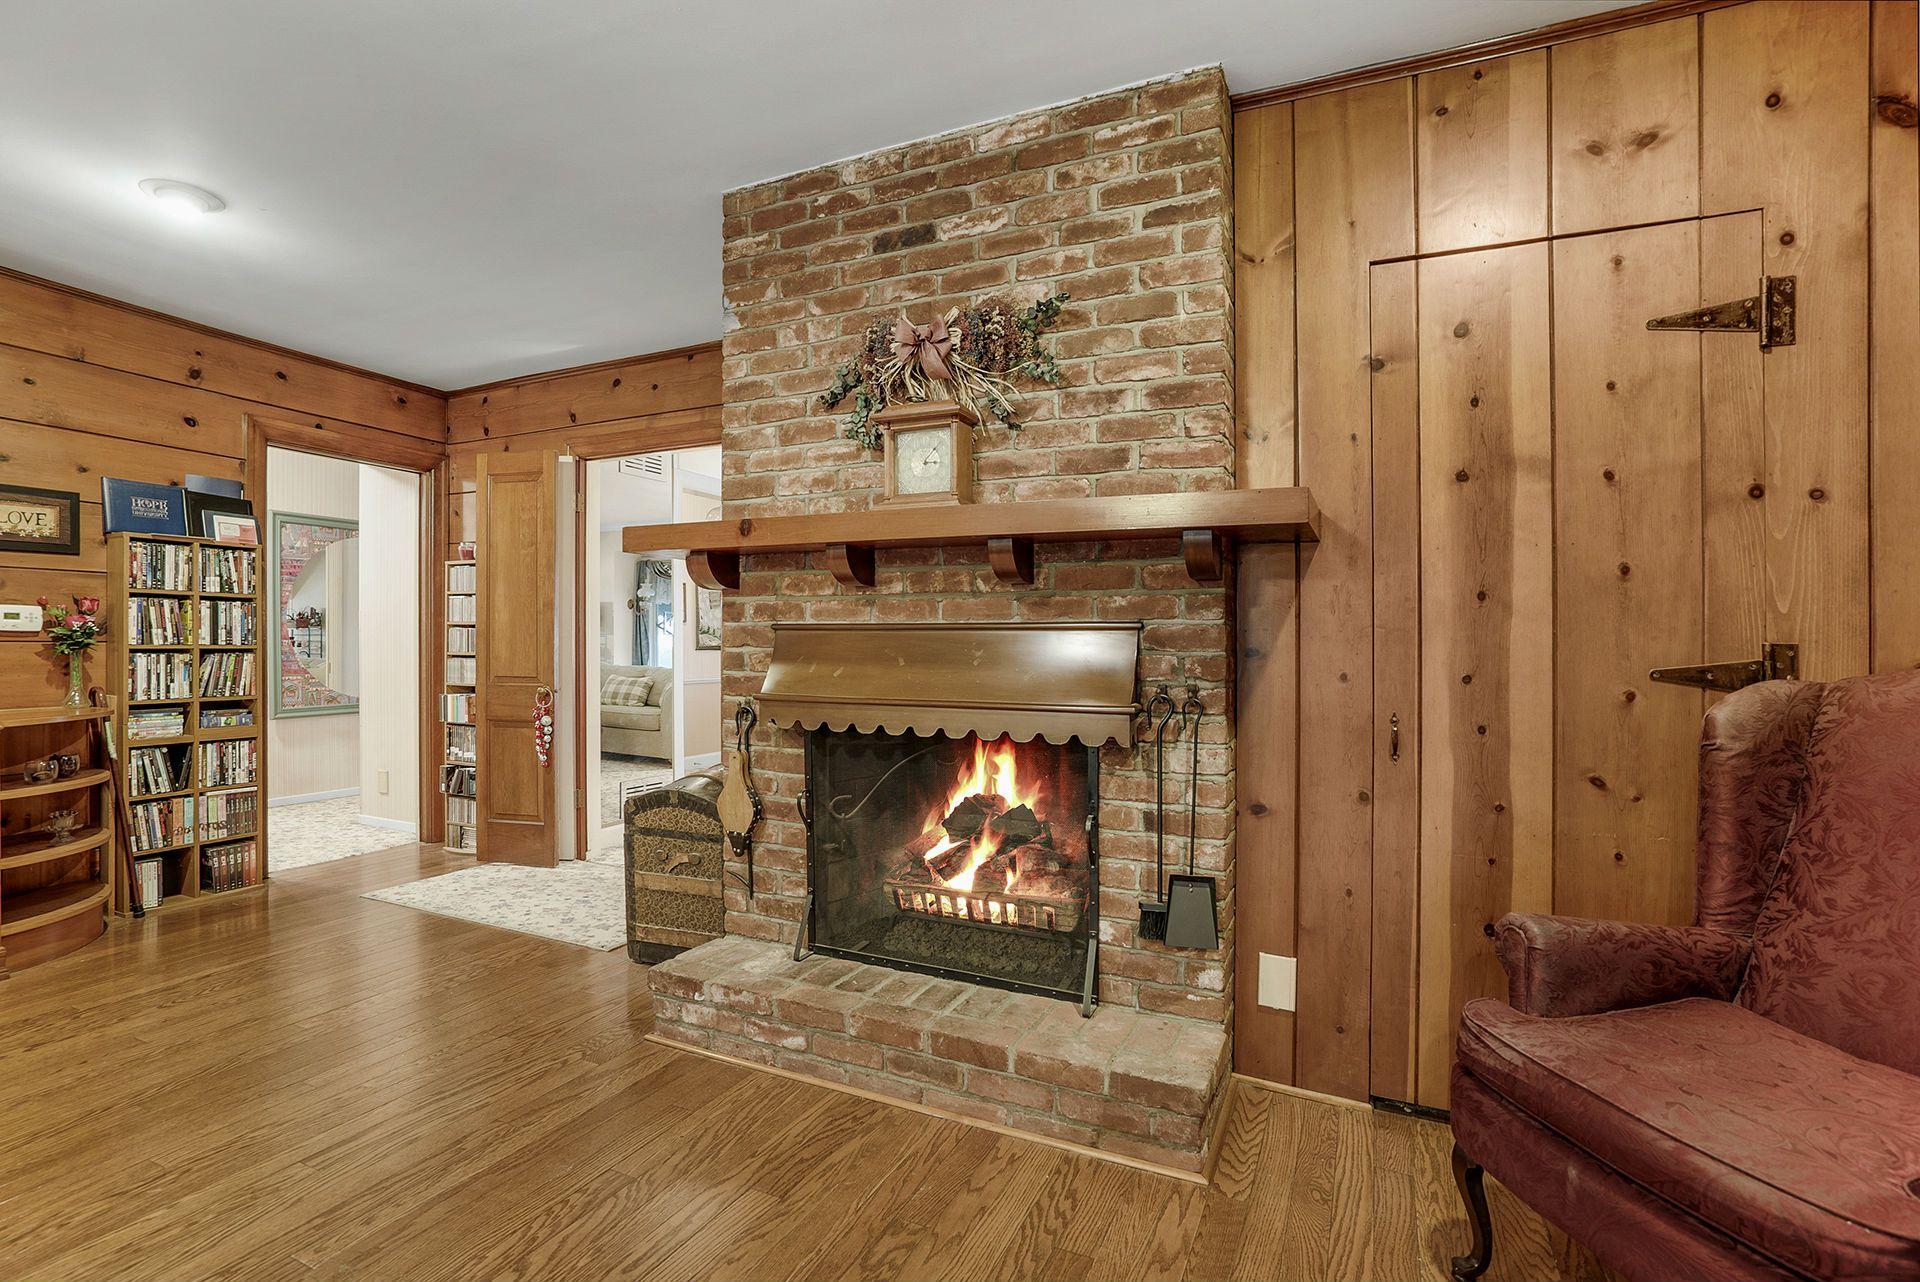 Family room fireplace with wraparound mantel.